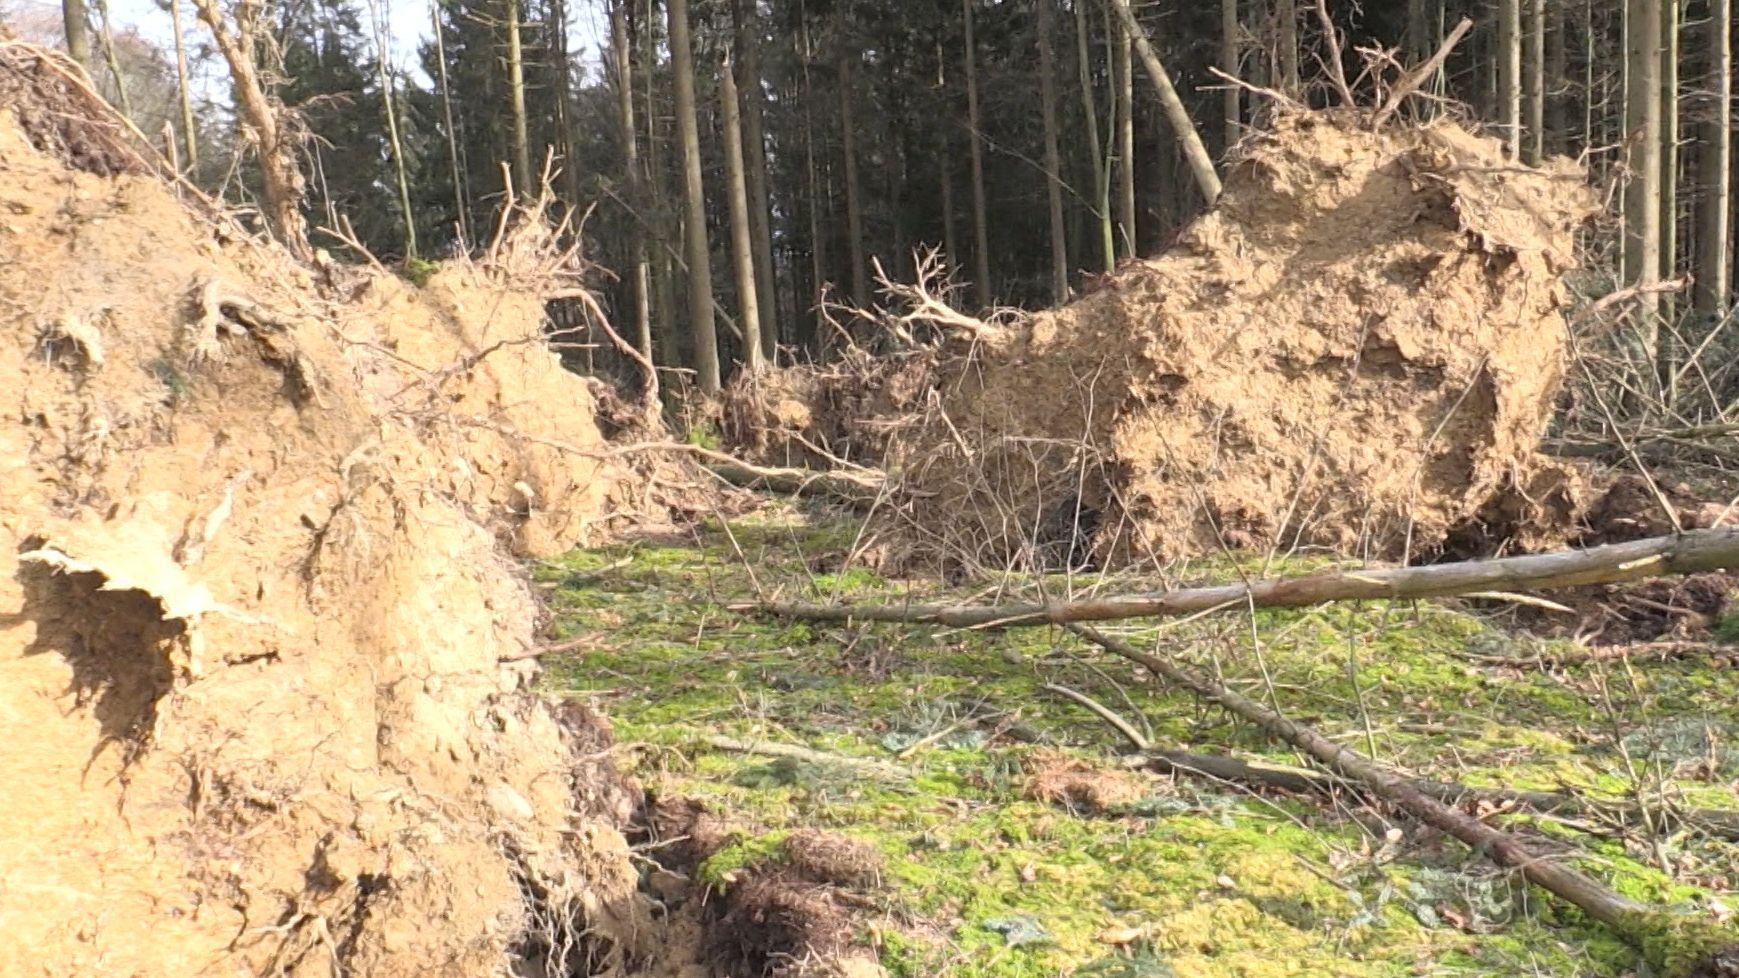 Entwurzelte Bäume im Wald